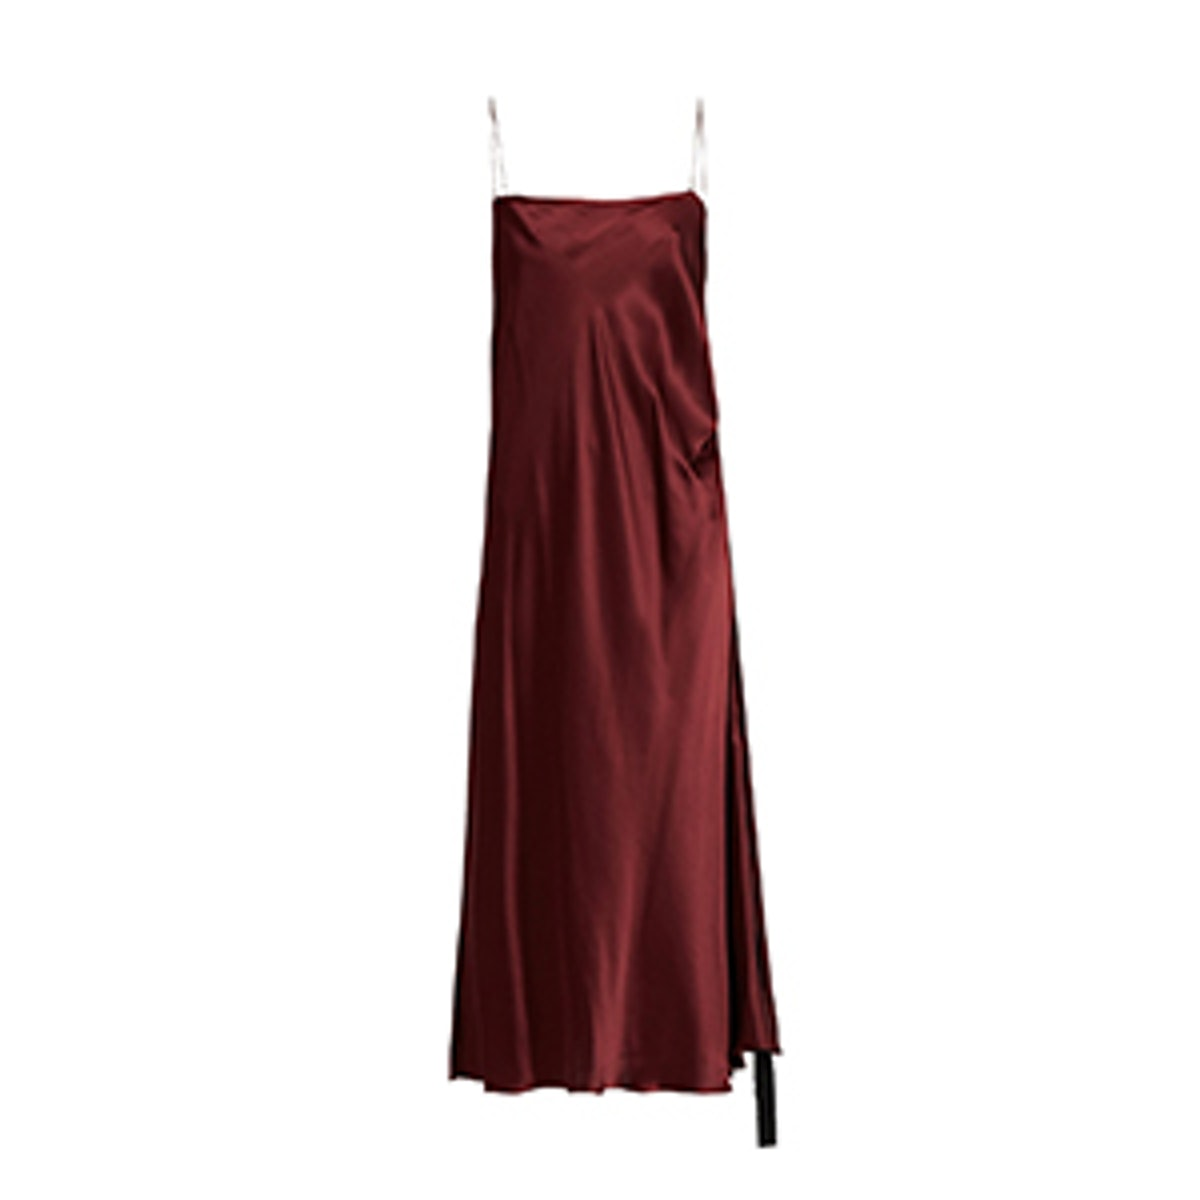 Tony Ruched-Side Silk-Satin Slip Dress